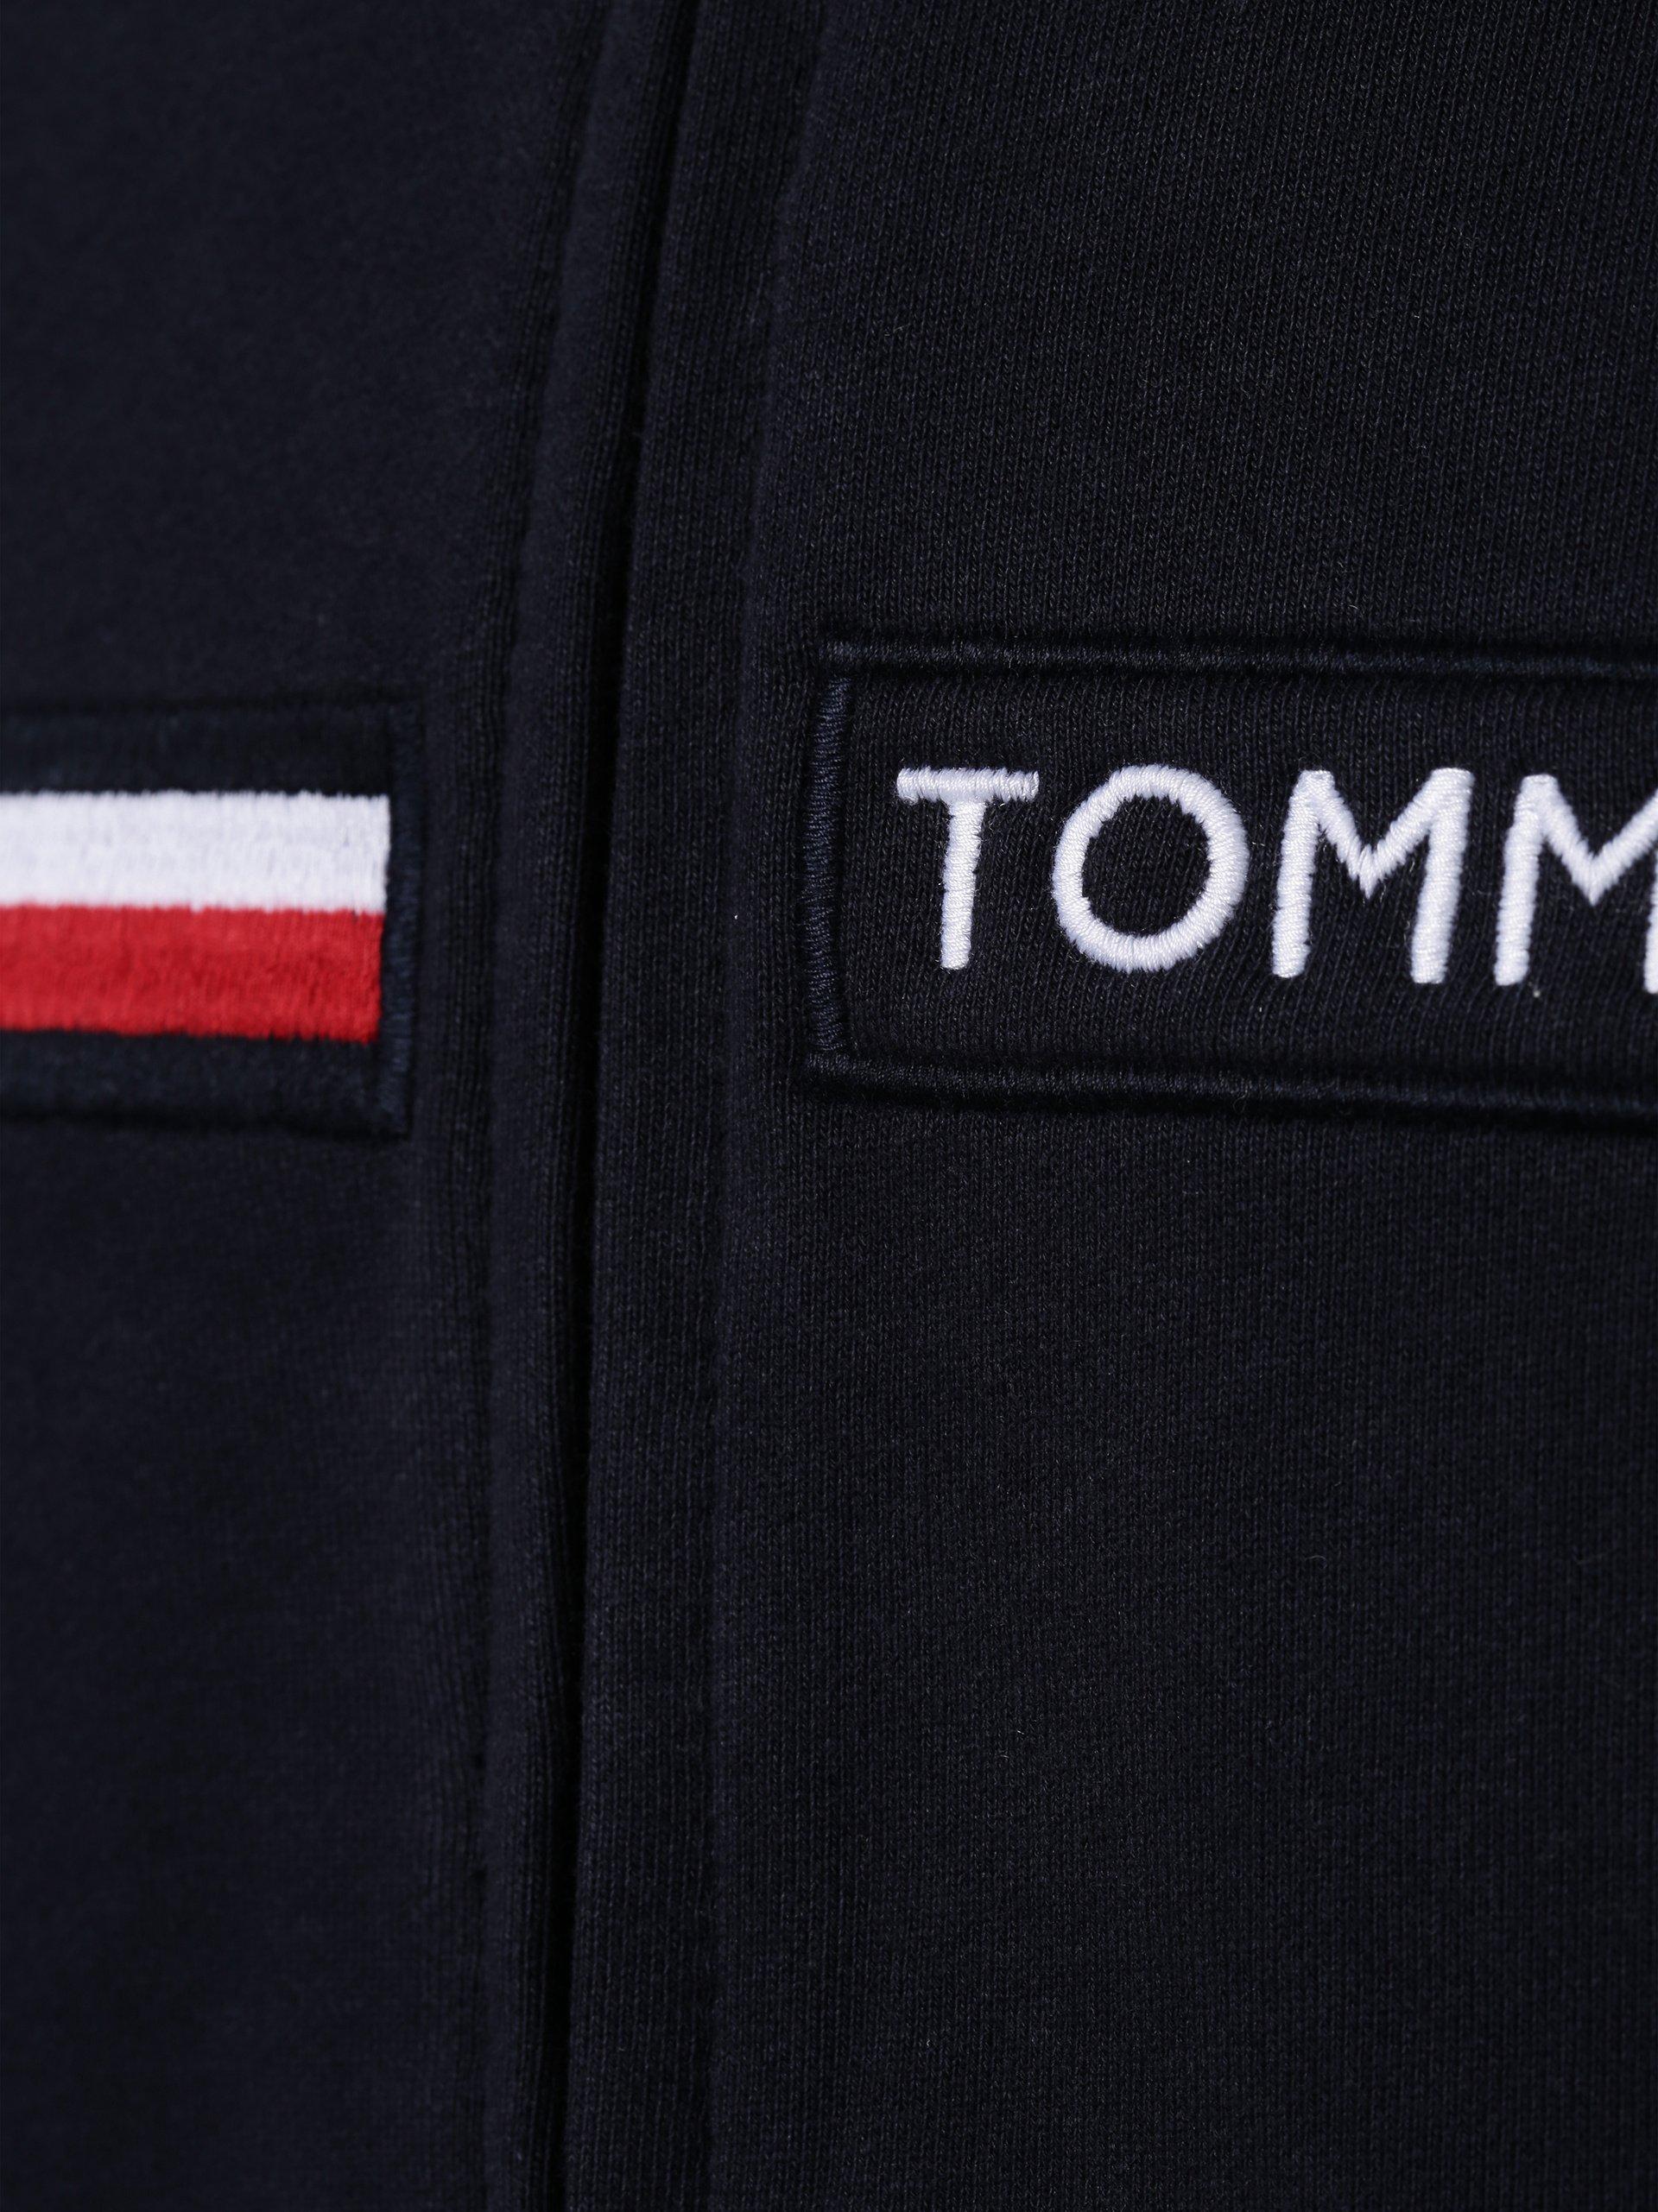 Tommy Hilfiger Herren Sweatjacke